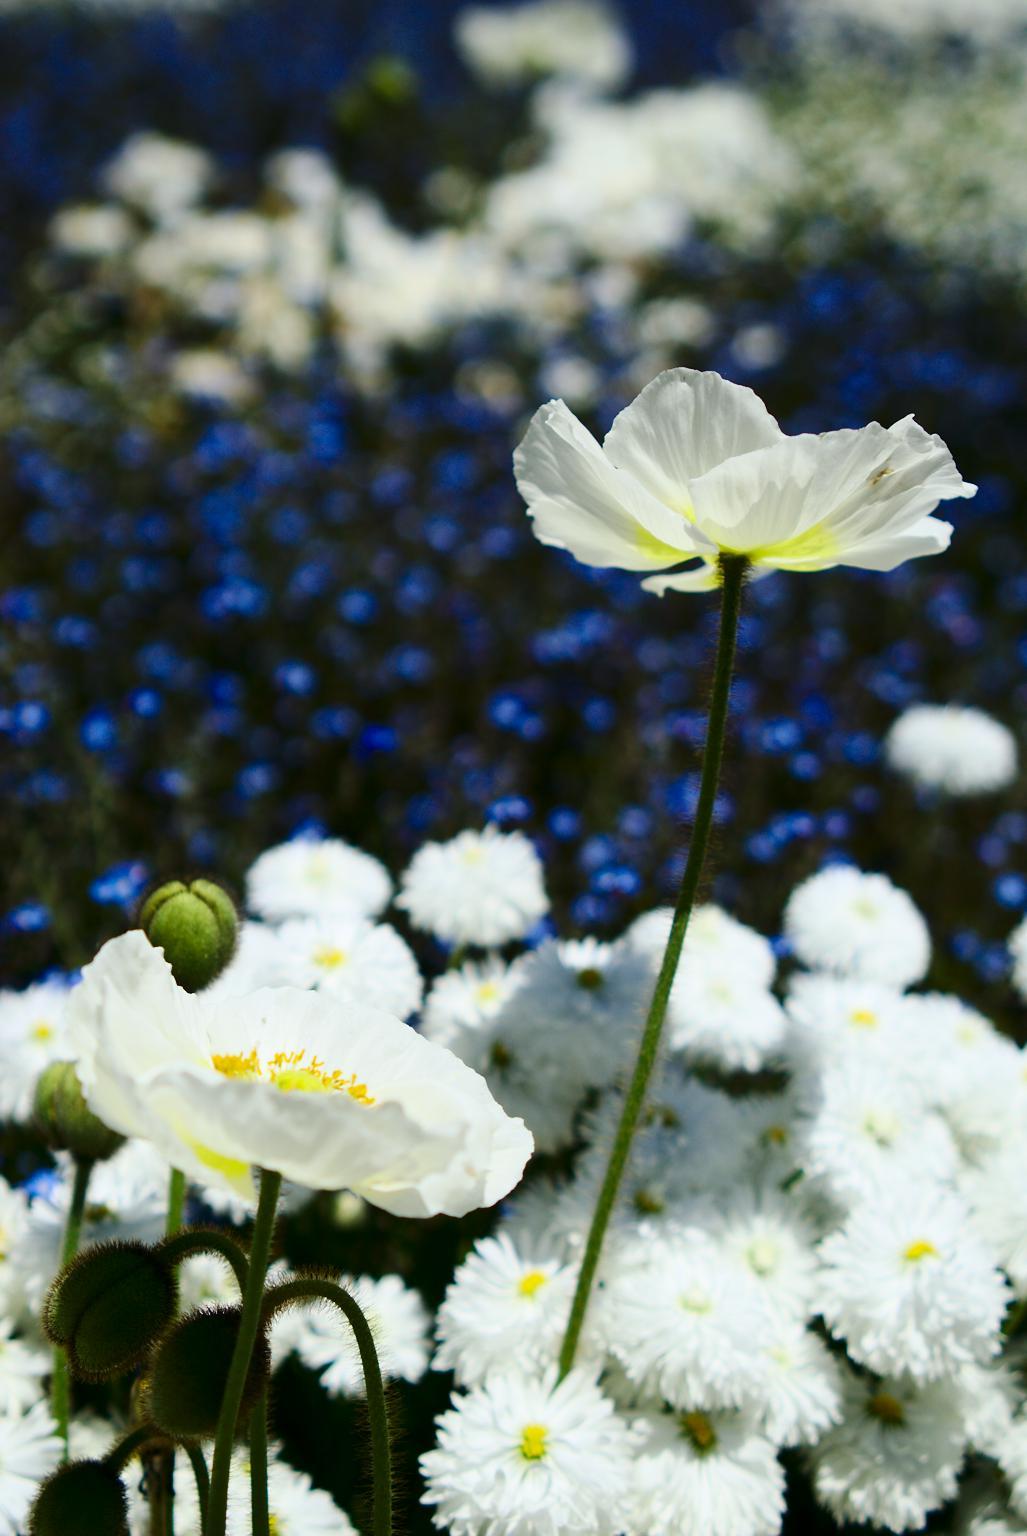 {filename}/img/mainau-kvetiny-4.jpg